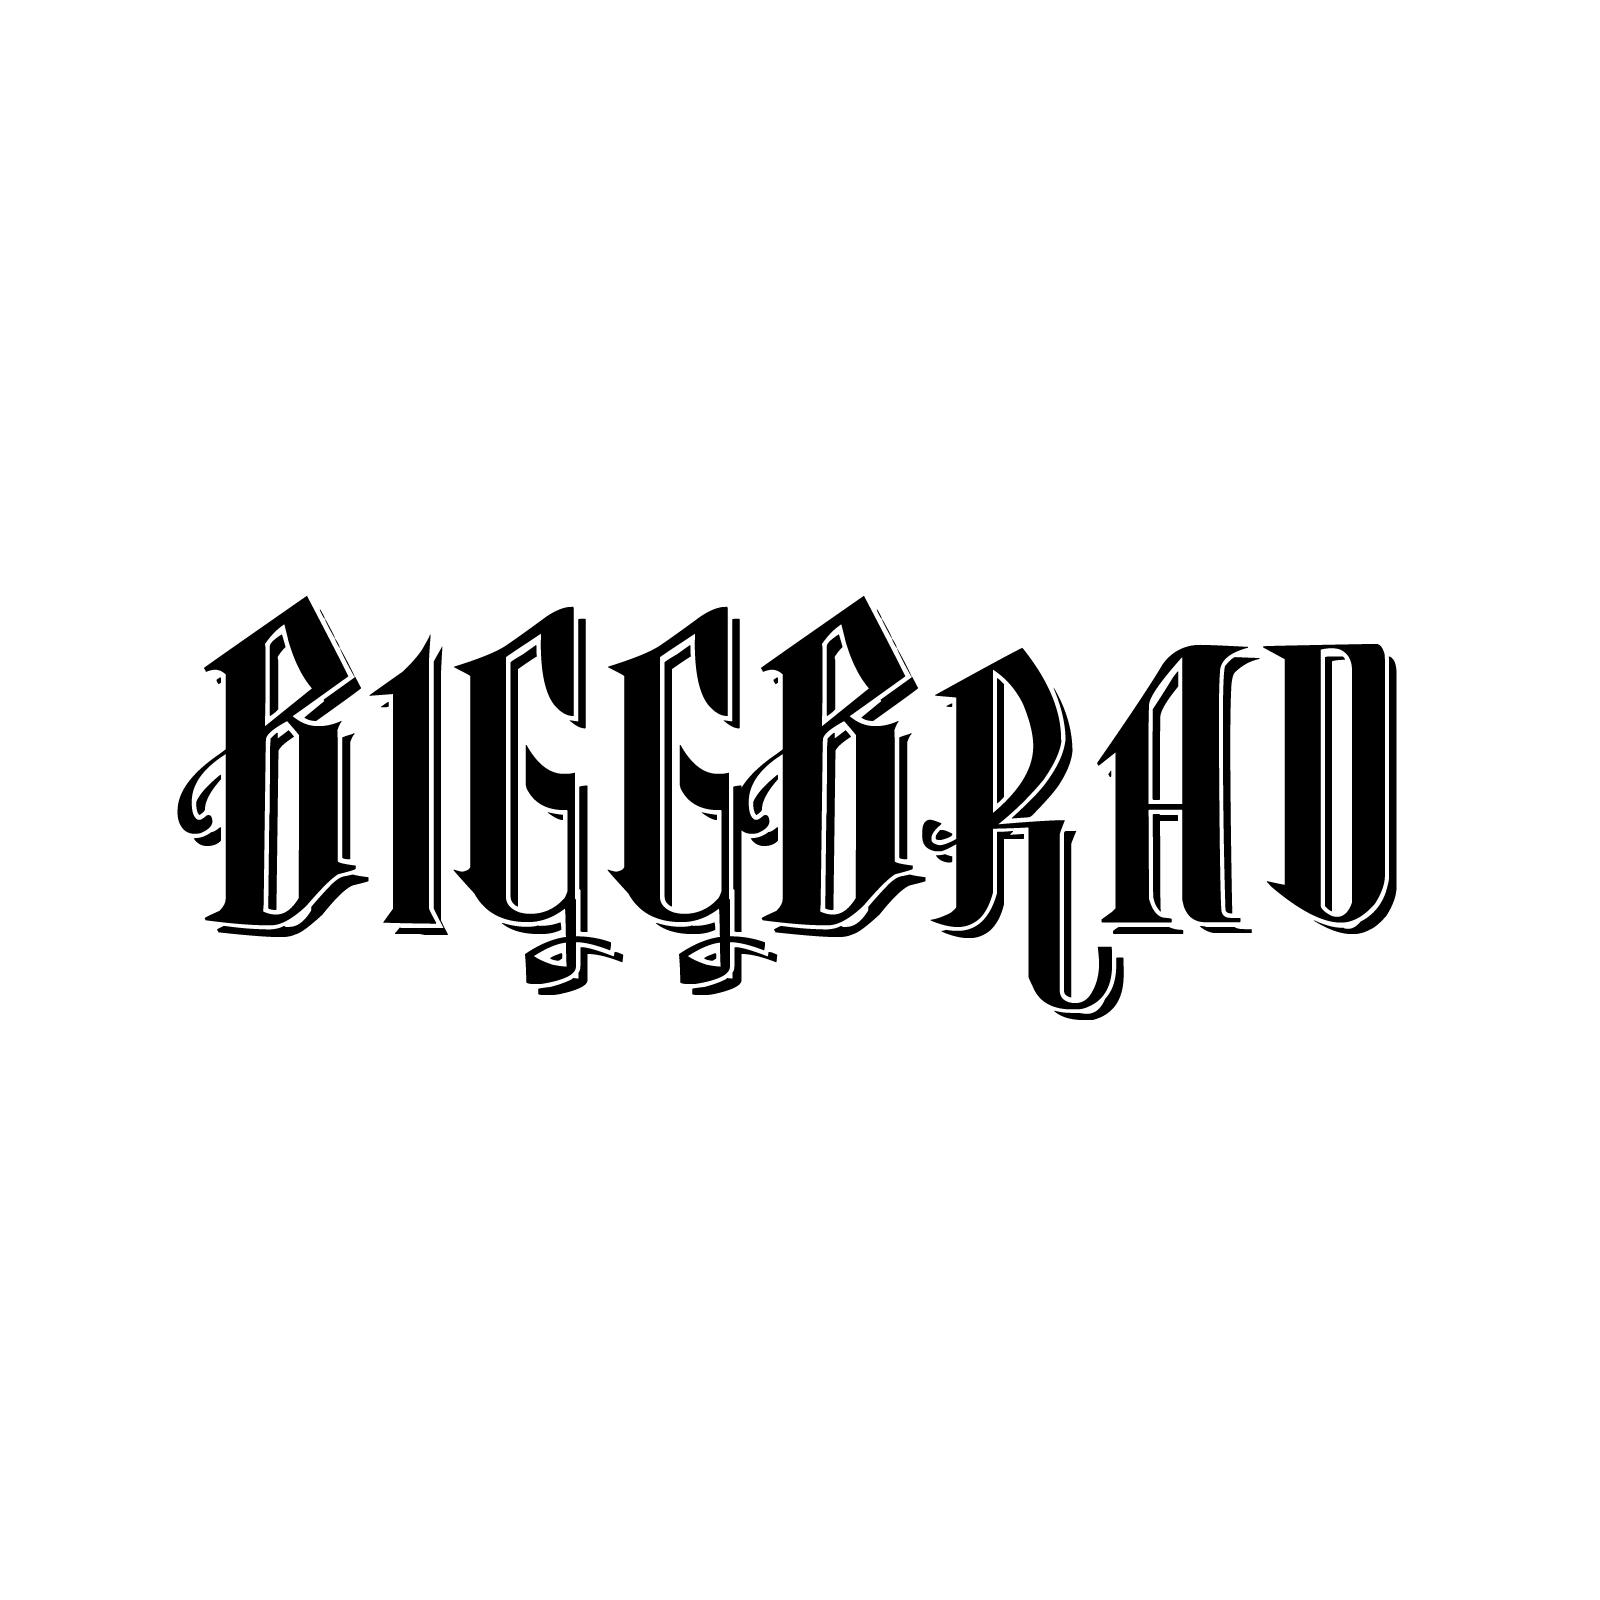 BiggBrad - 'Self Titled' EP